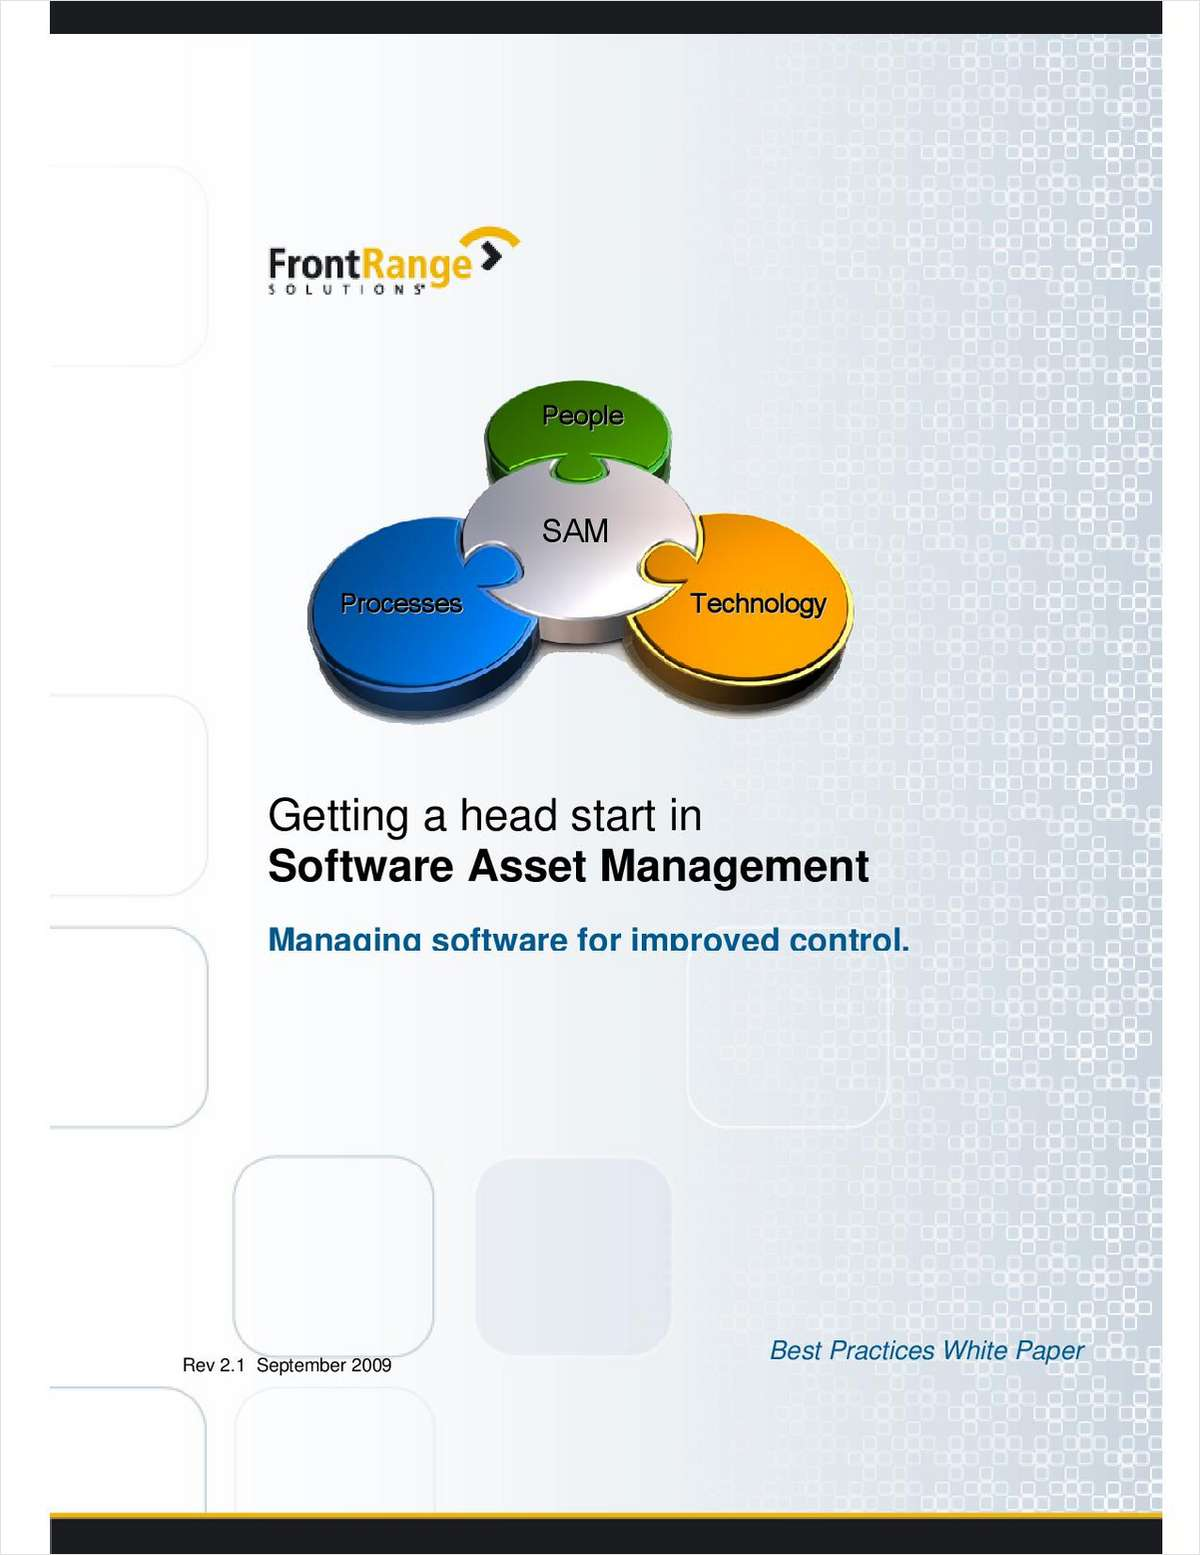 Getting a Head Start in Software Asset Management